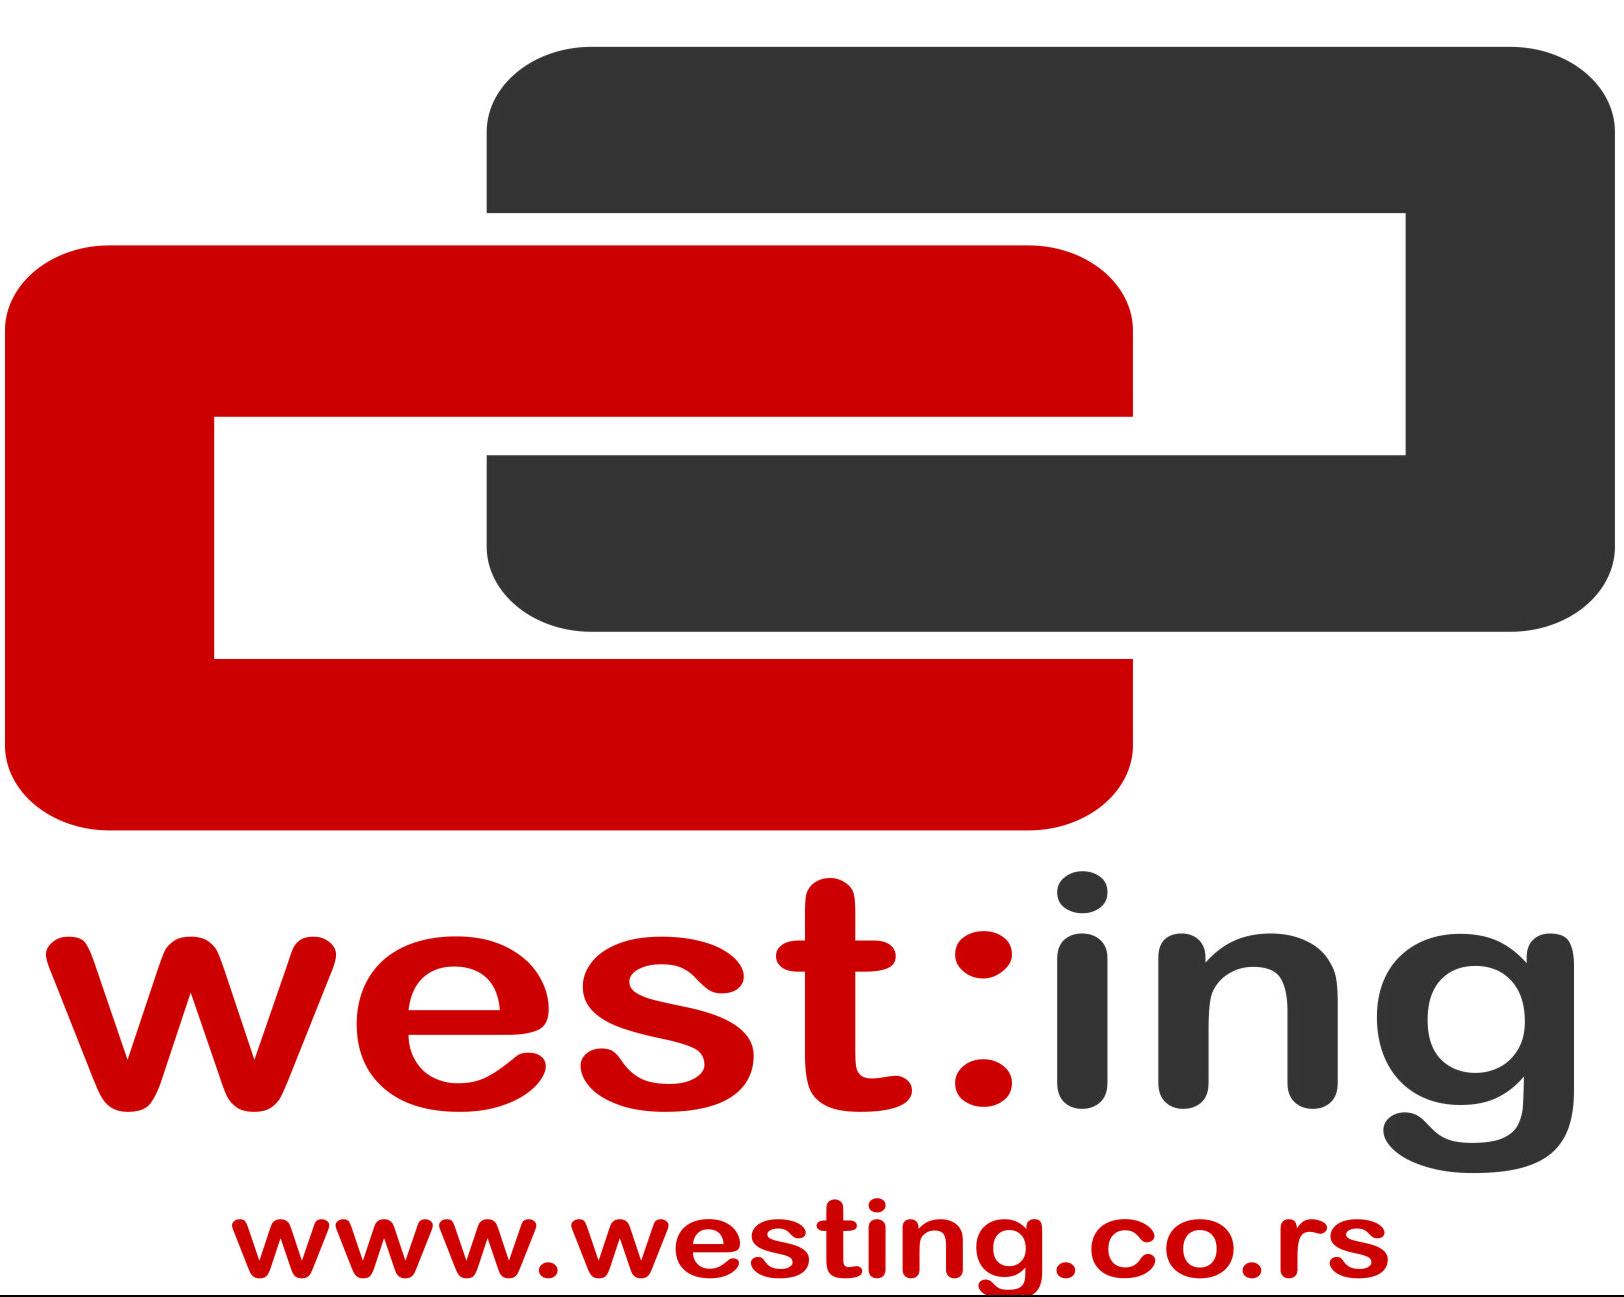 Westing logo